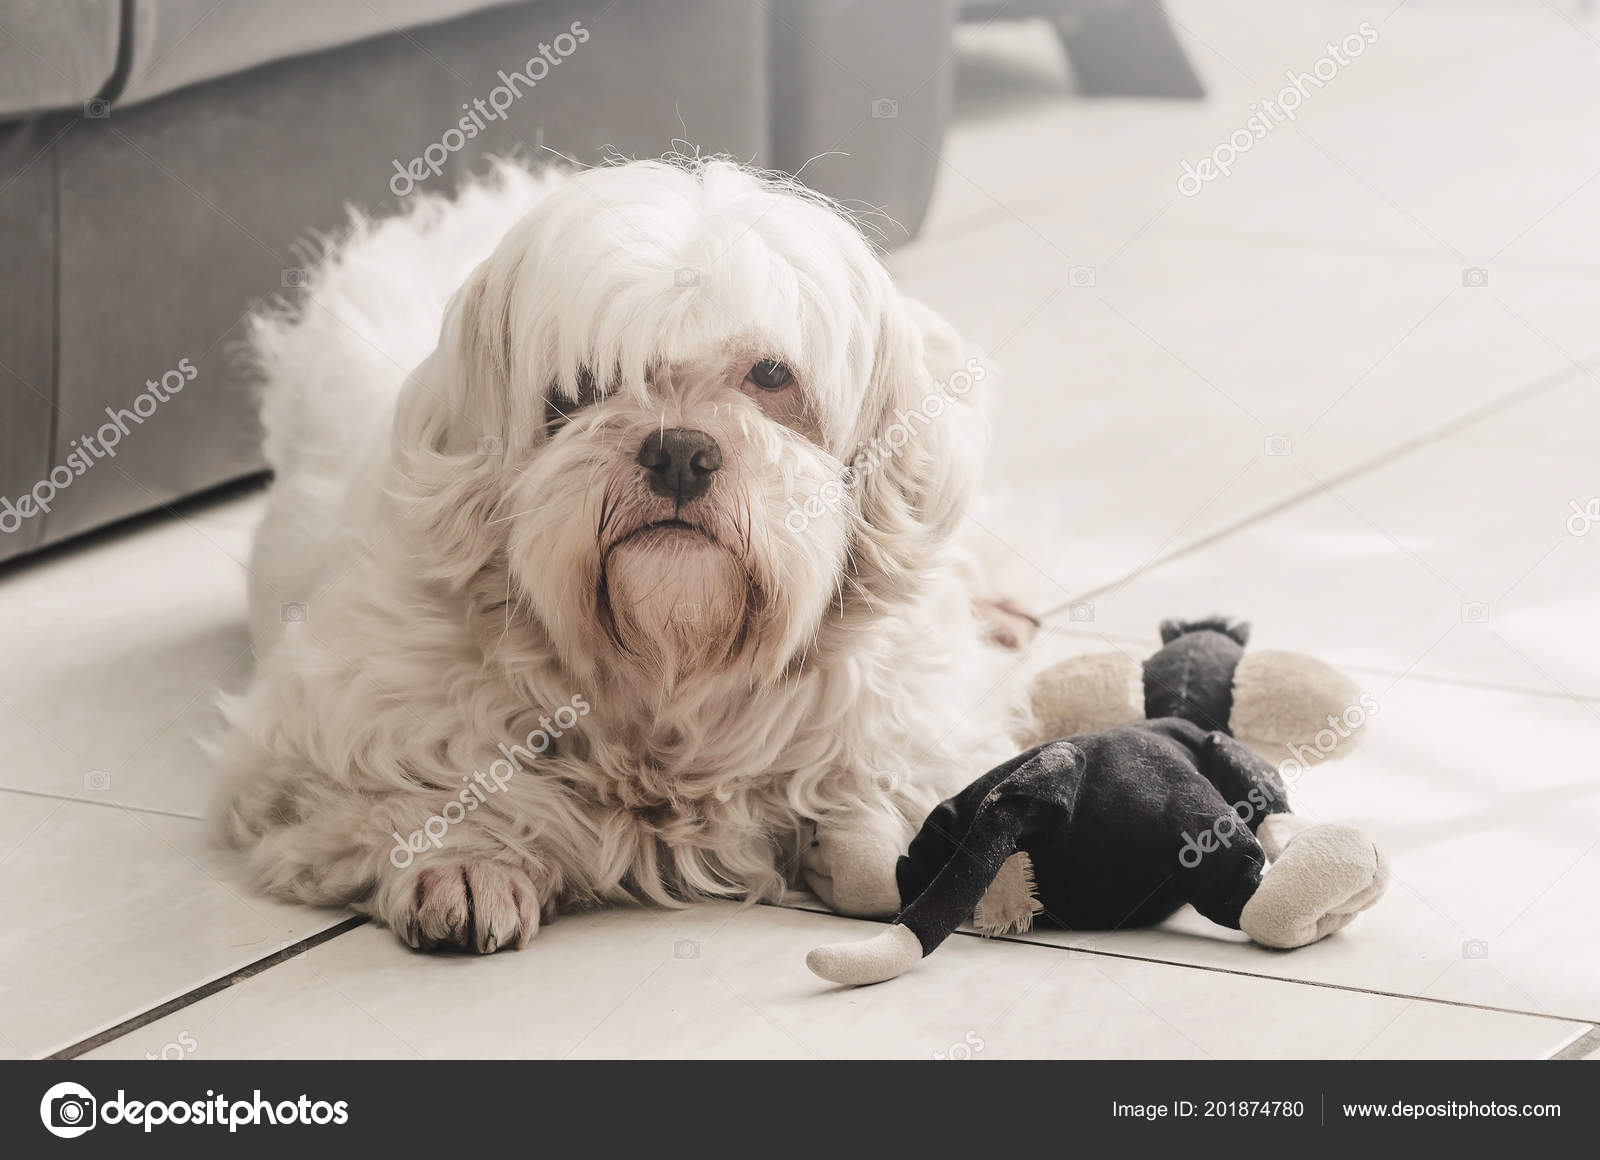 Furry White Dog Ground His Teddy Toy Side Stock Photo